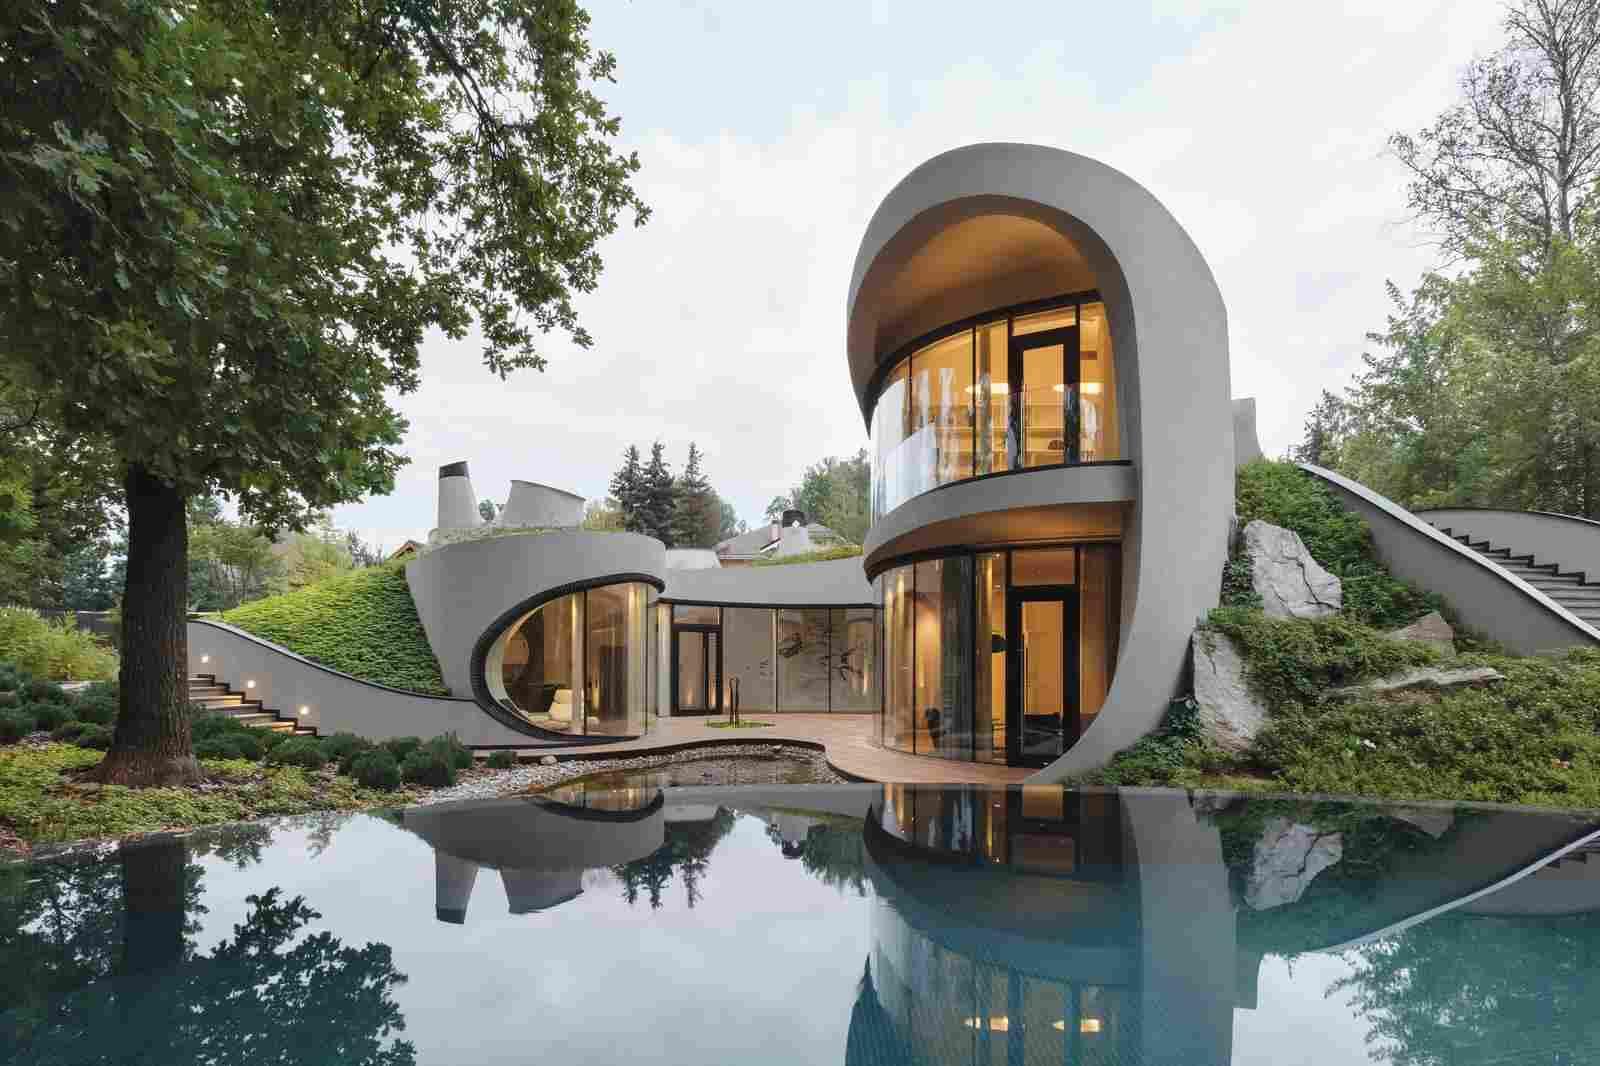 Покупка дома через агентство недвижимости